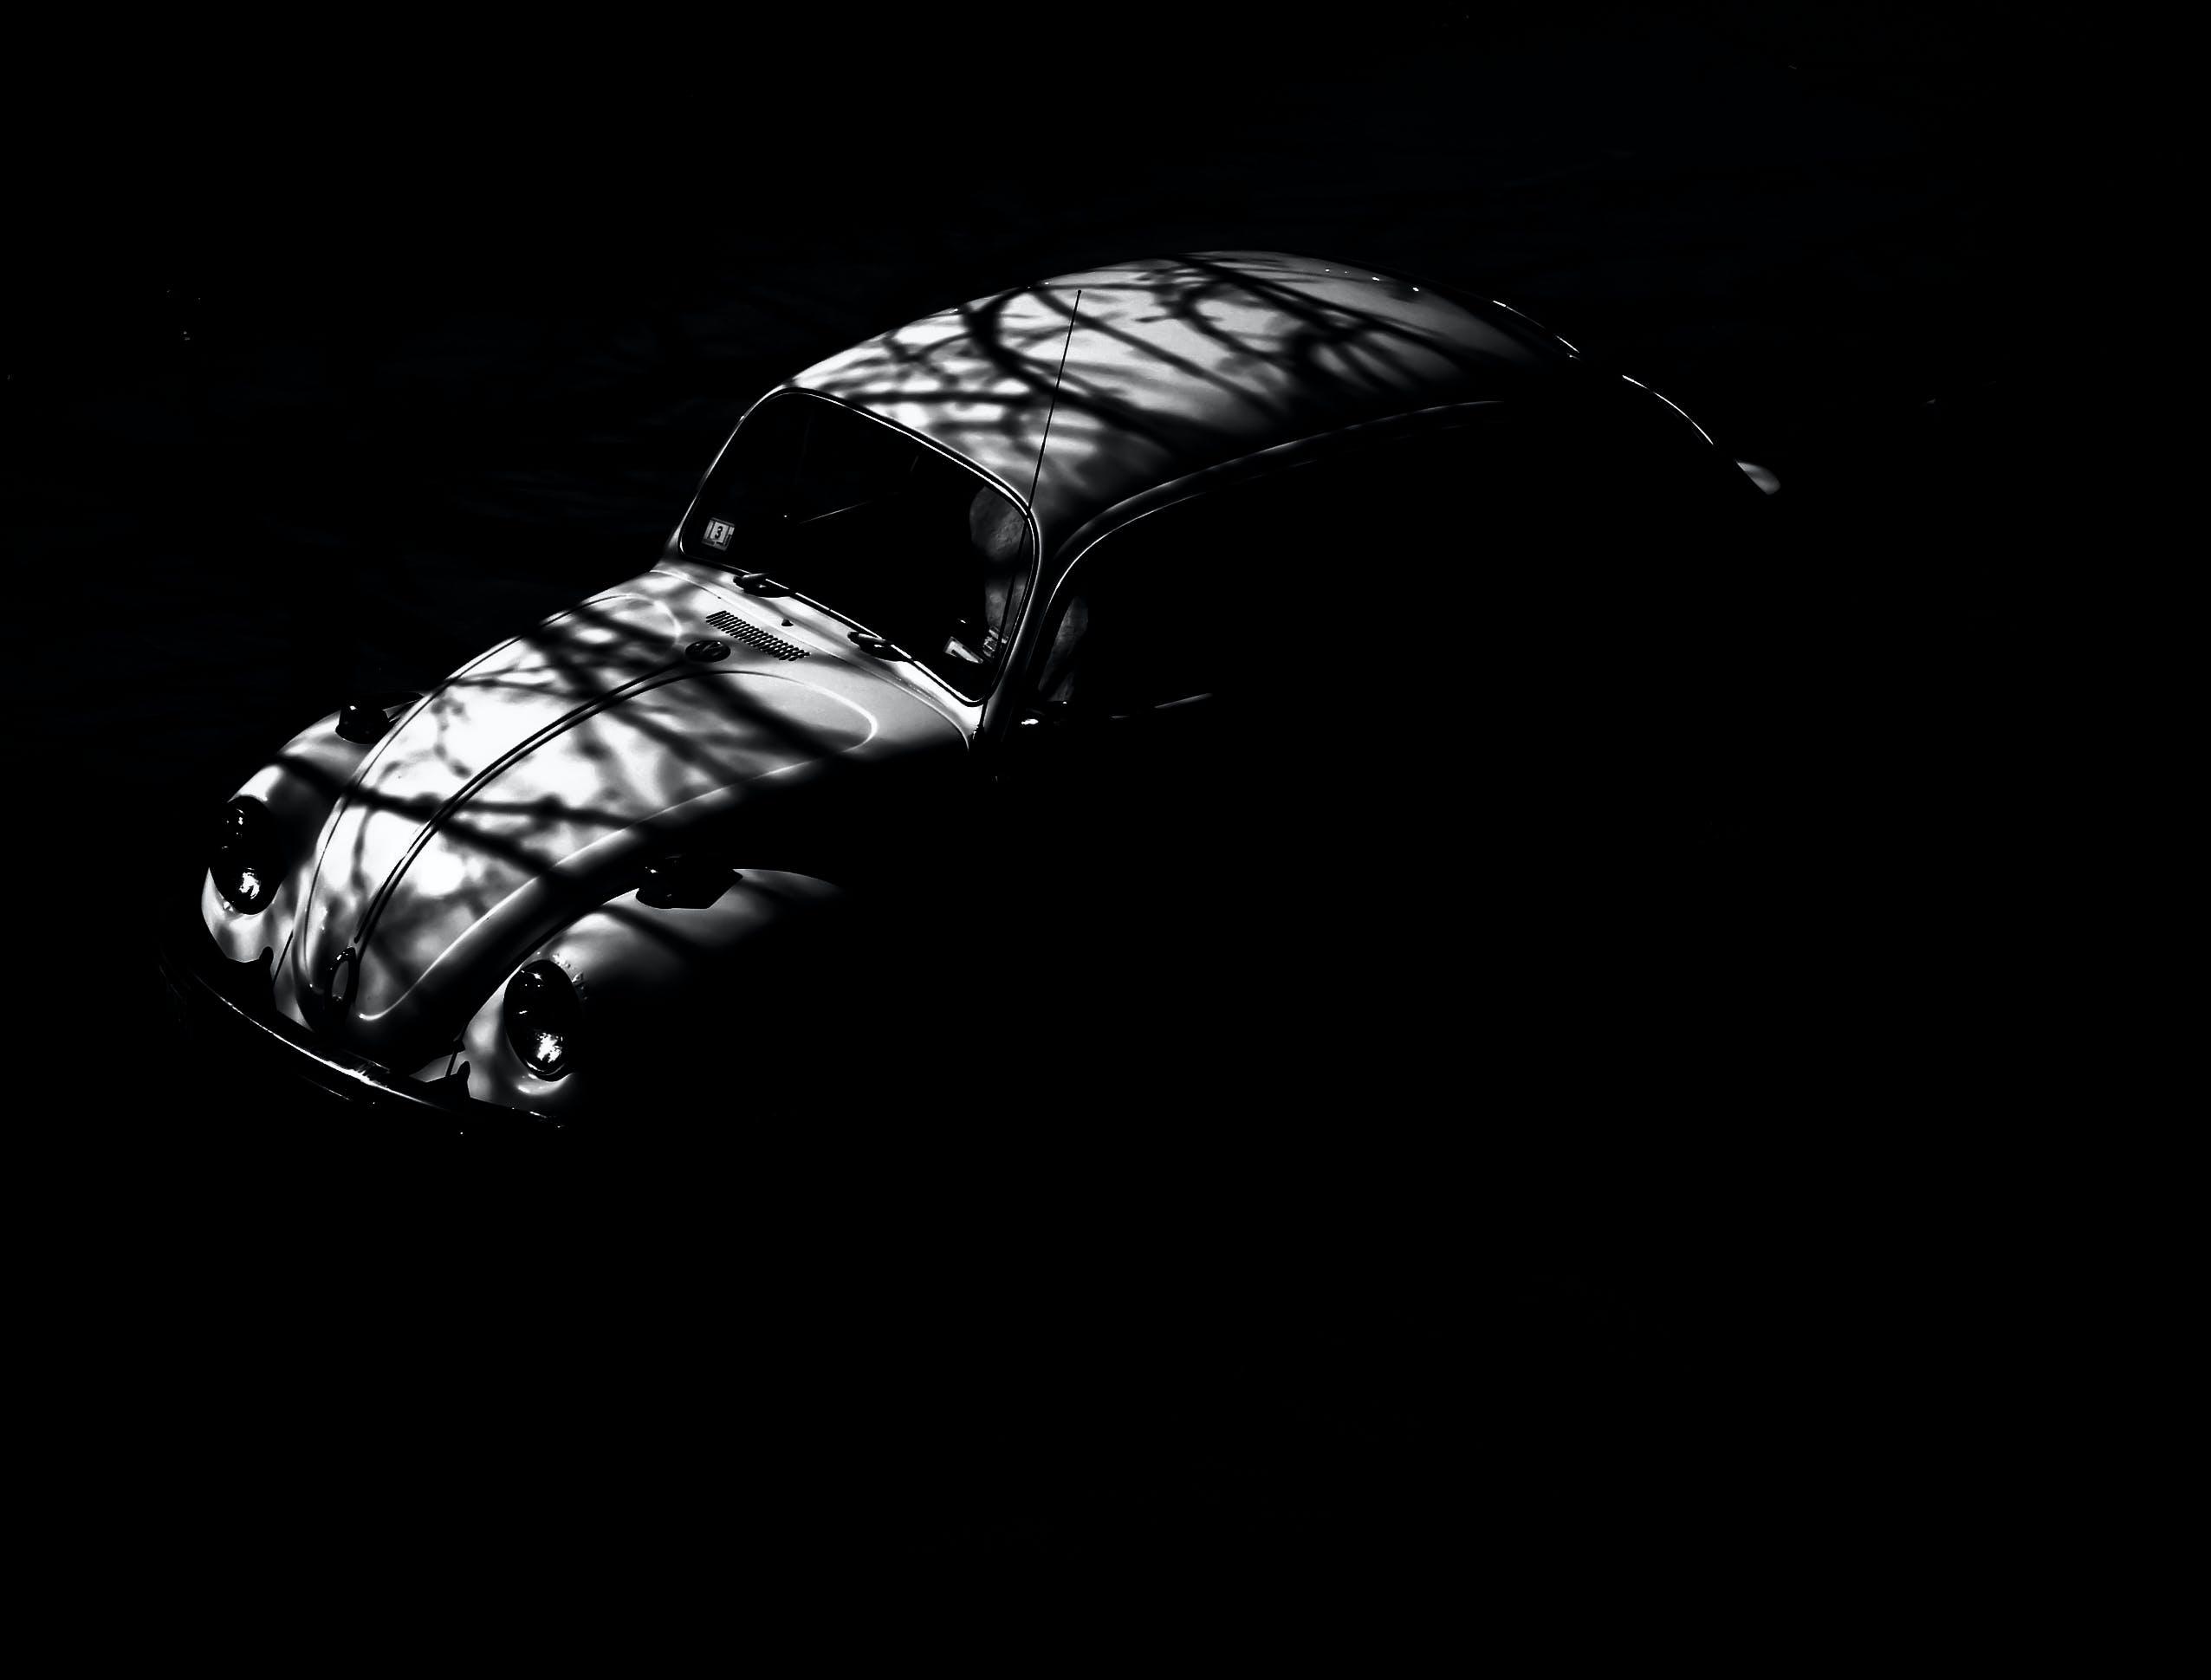 Gratis stockfoto met auto, donker, duisternis, kever